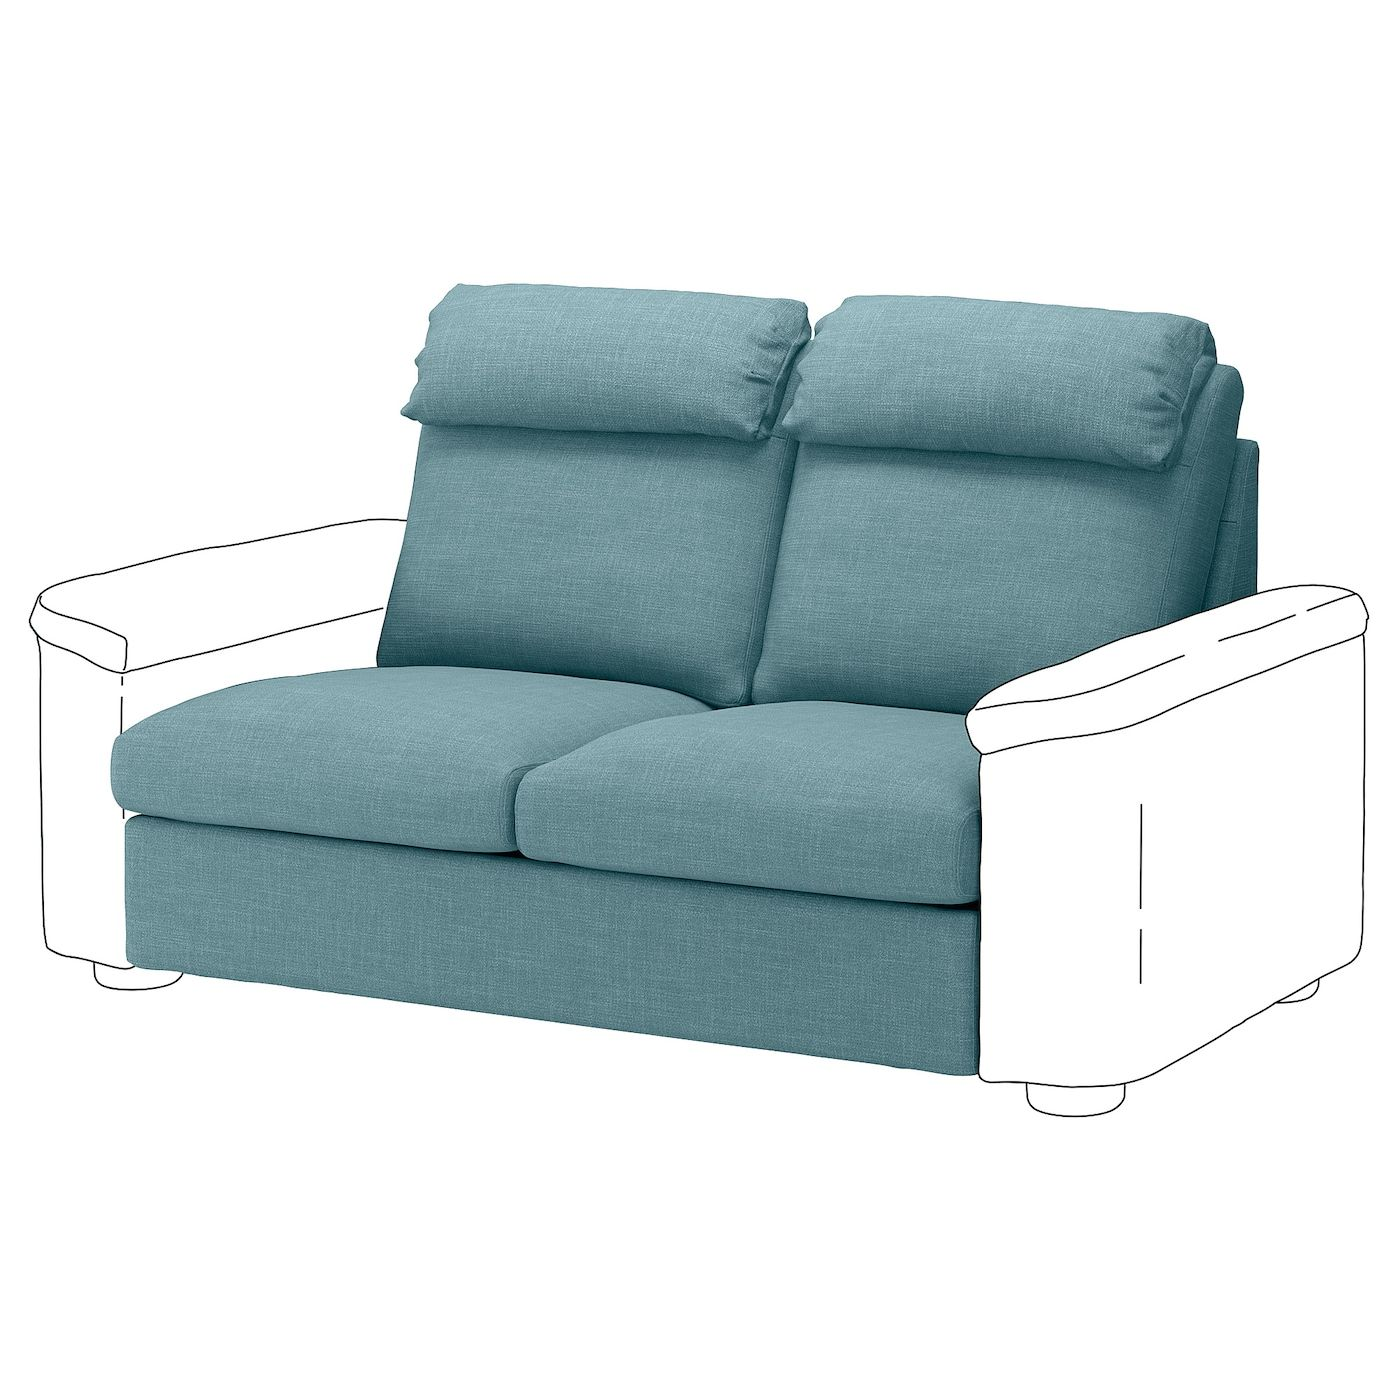 Lidhult Bezug 2er Bettsofaelement Gassebol Blaugrau Ikea Osterreich Blau Grau Kleines Sofa Sofa